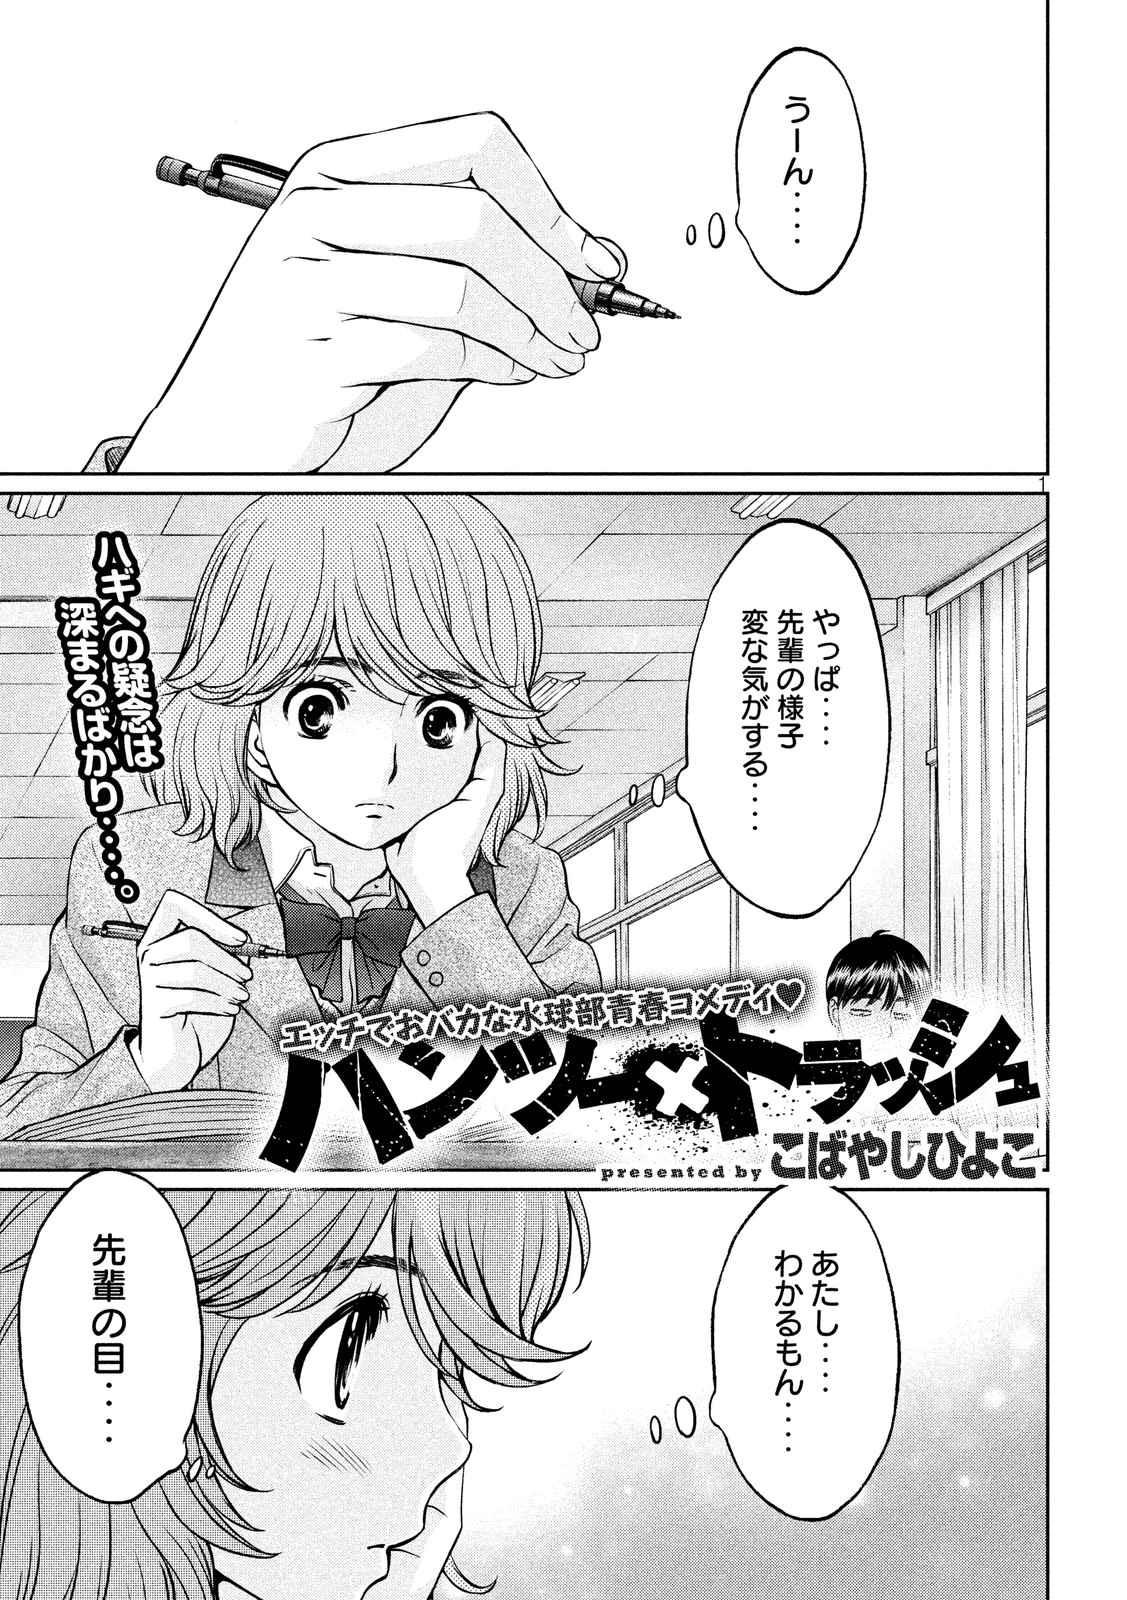 Hantsu x Trash - Chapter 134 - Page 1